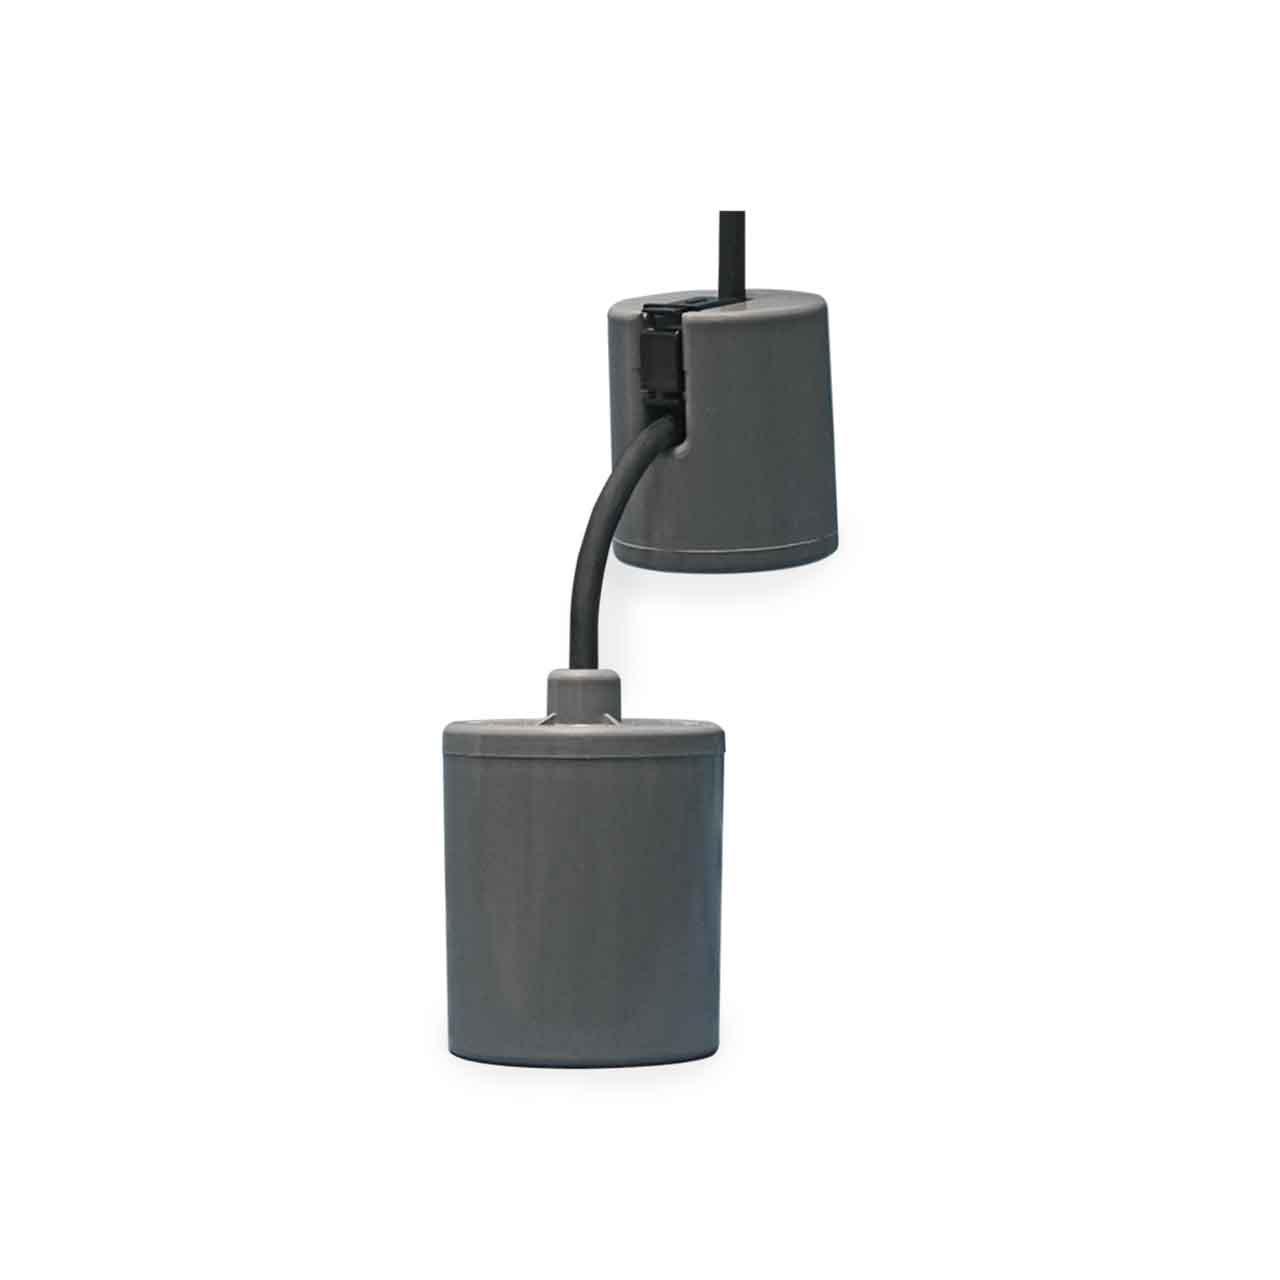 SJERhombus 30PMWPSWE PumpMaster WPS Pump Switch Pump Up or Down 30 Cord Weighted Externally SJE Rhom